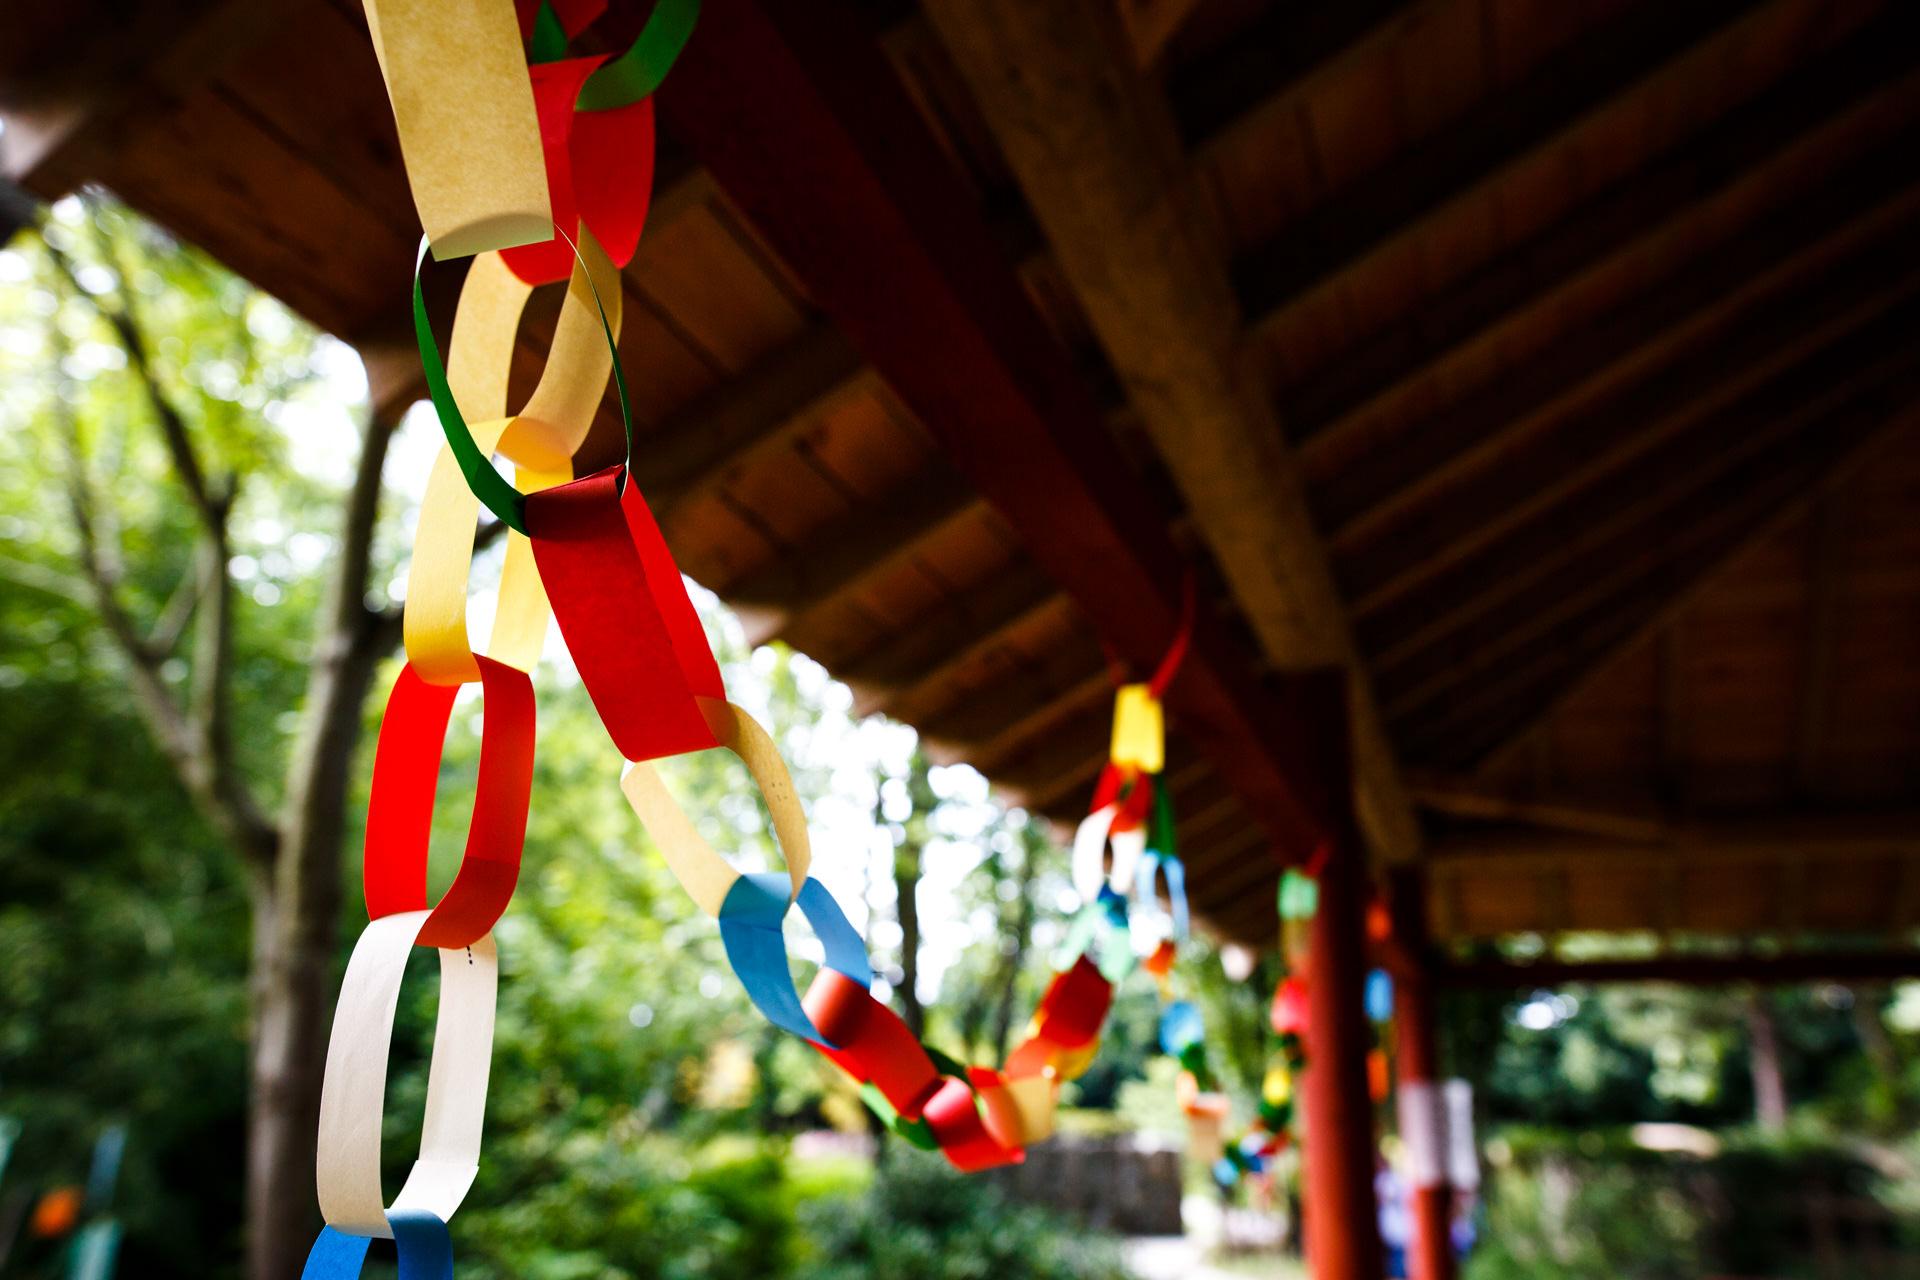 Andrew Wilson Photography Liverpool (22) Festival Gardens Japanese Tanzaku Tanabata.jpg